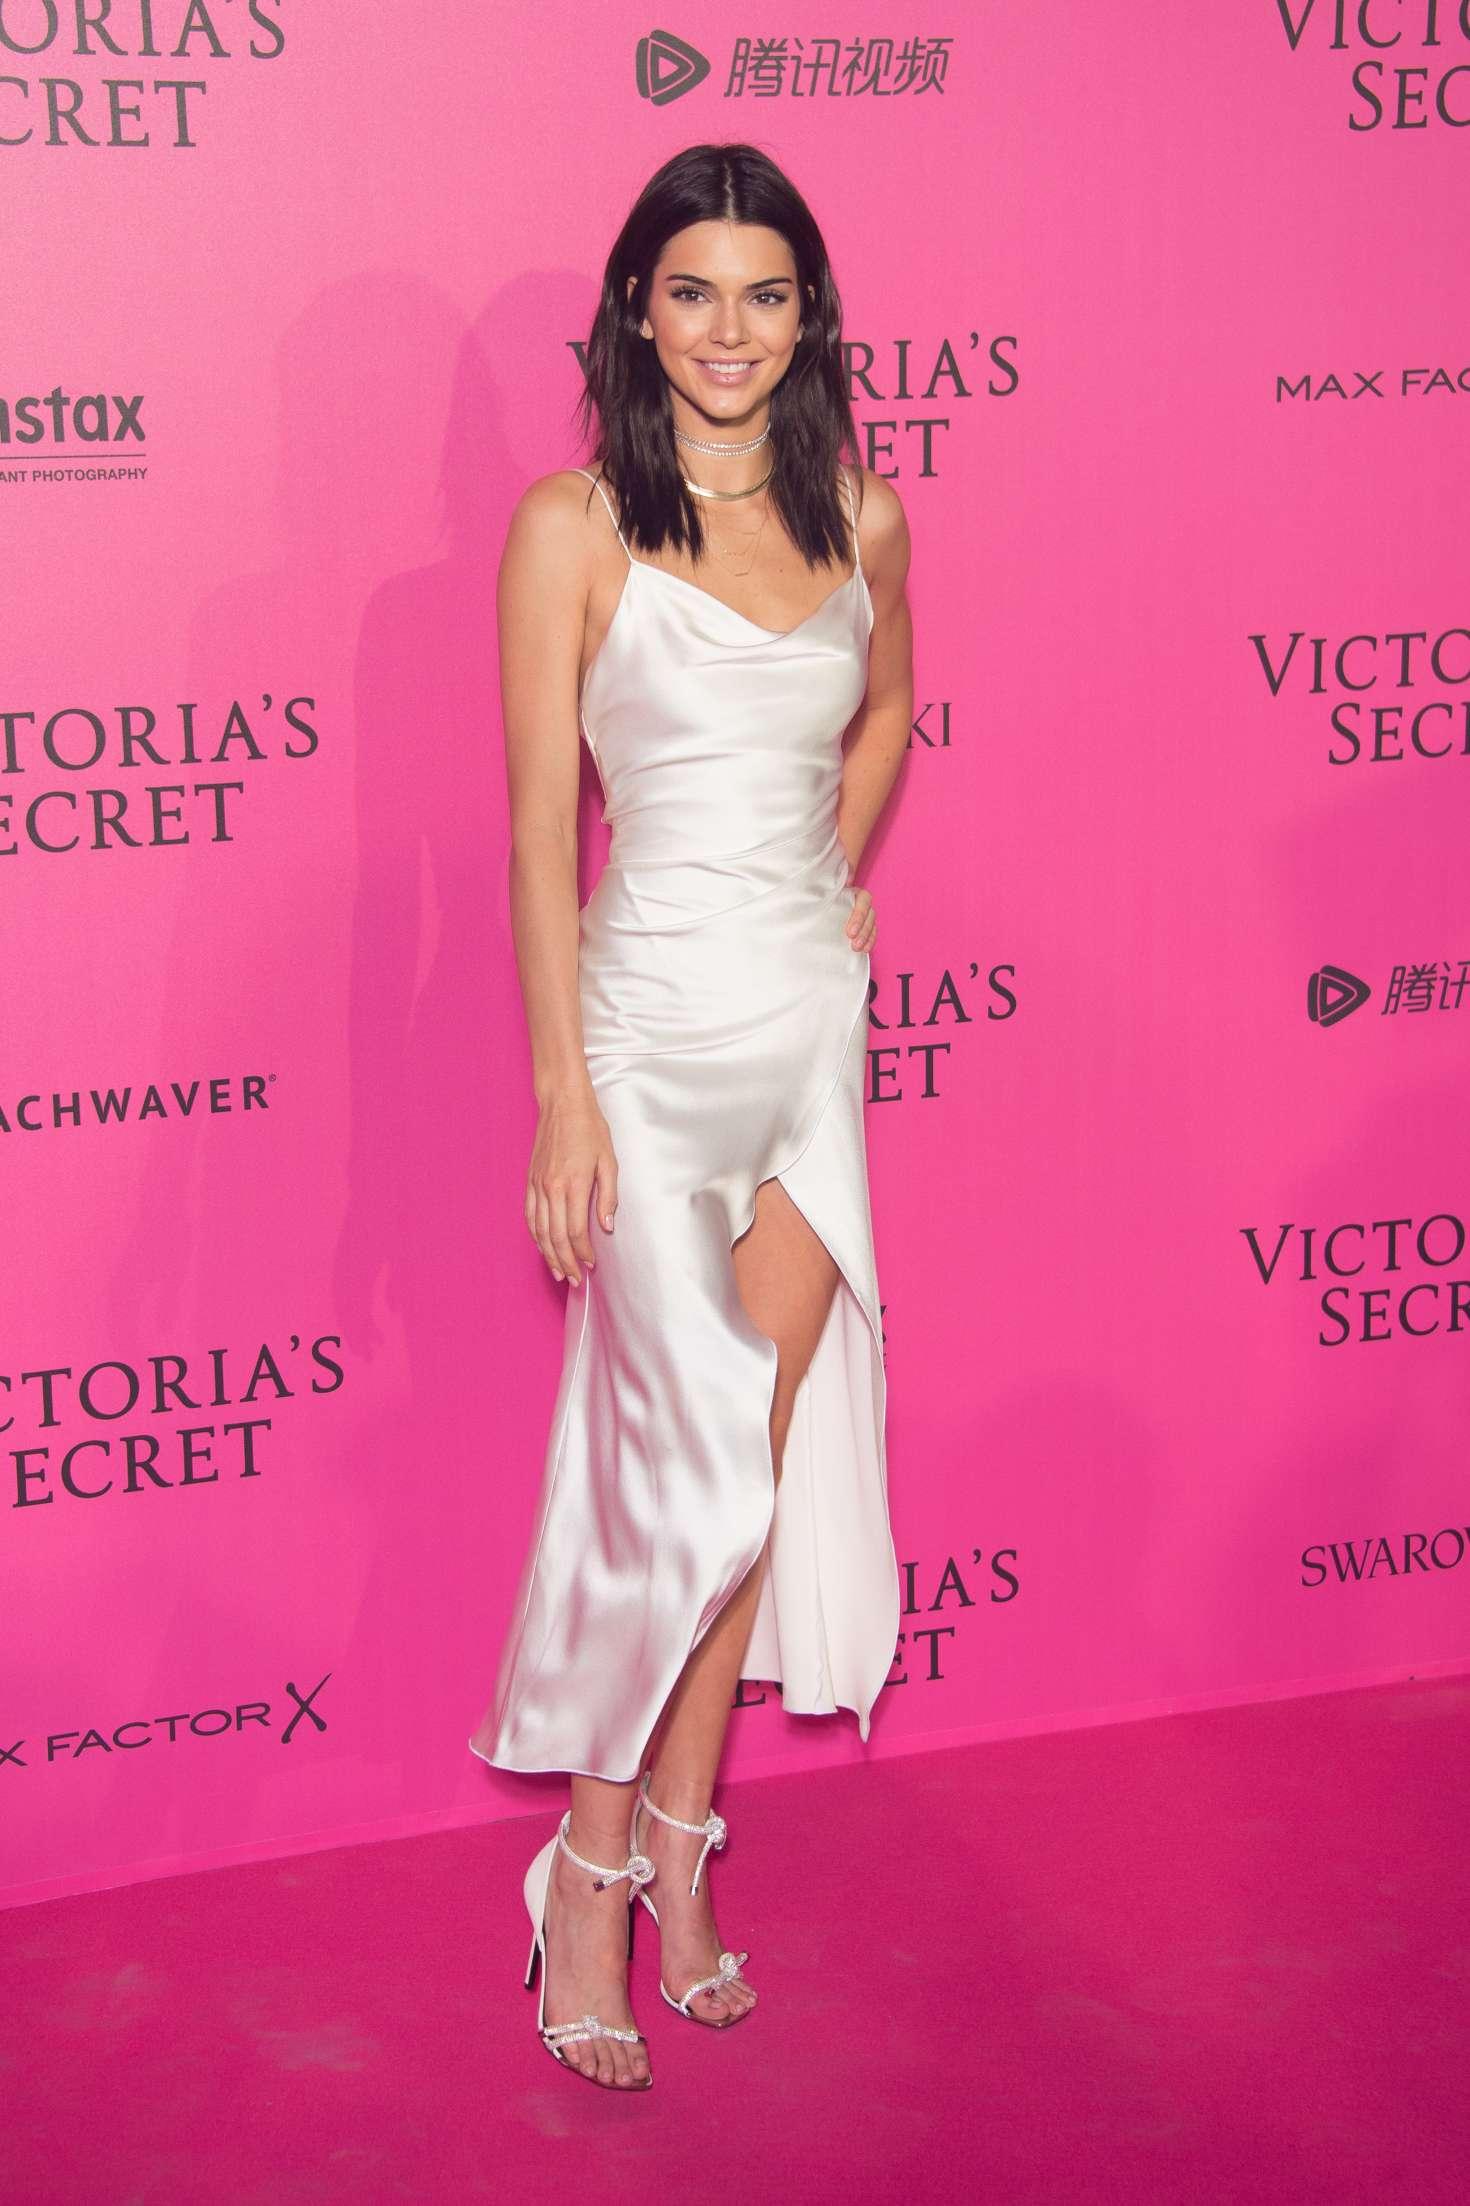 Victoria S Secret Fashion Show With Children